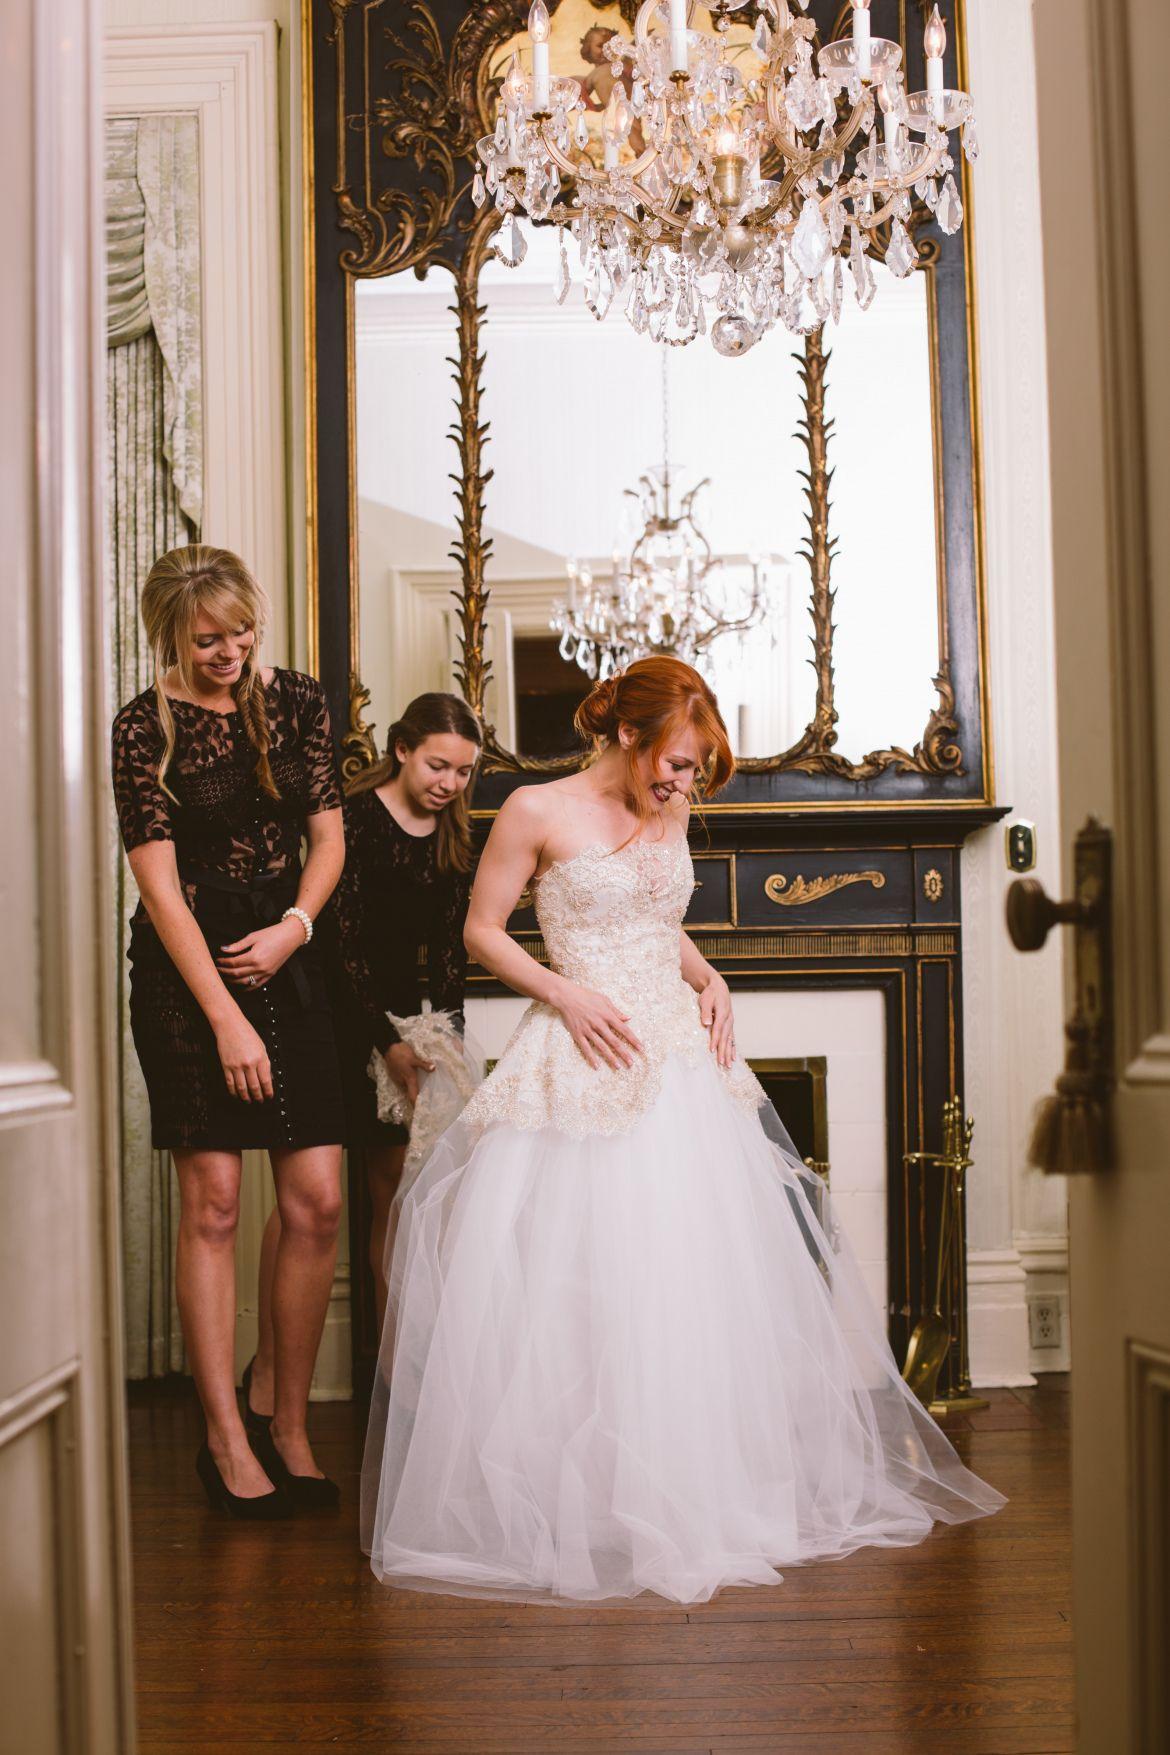 2019 Wedding Dresses Savannah Ga - Wedding Dresses for Guests Check ...